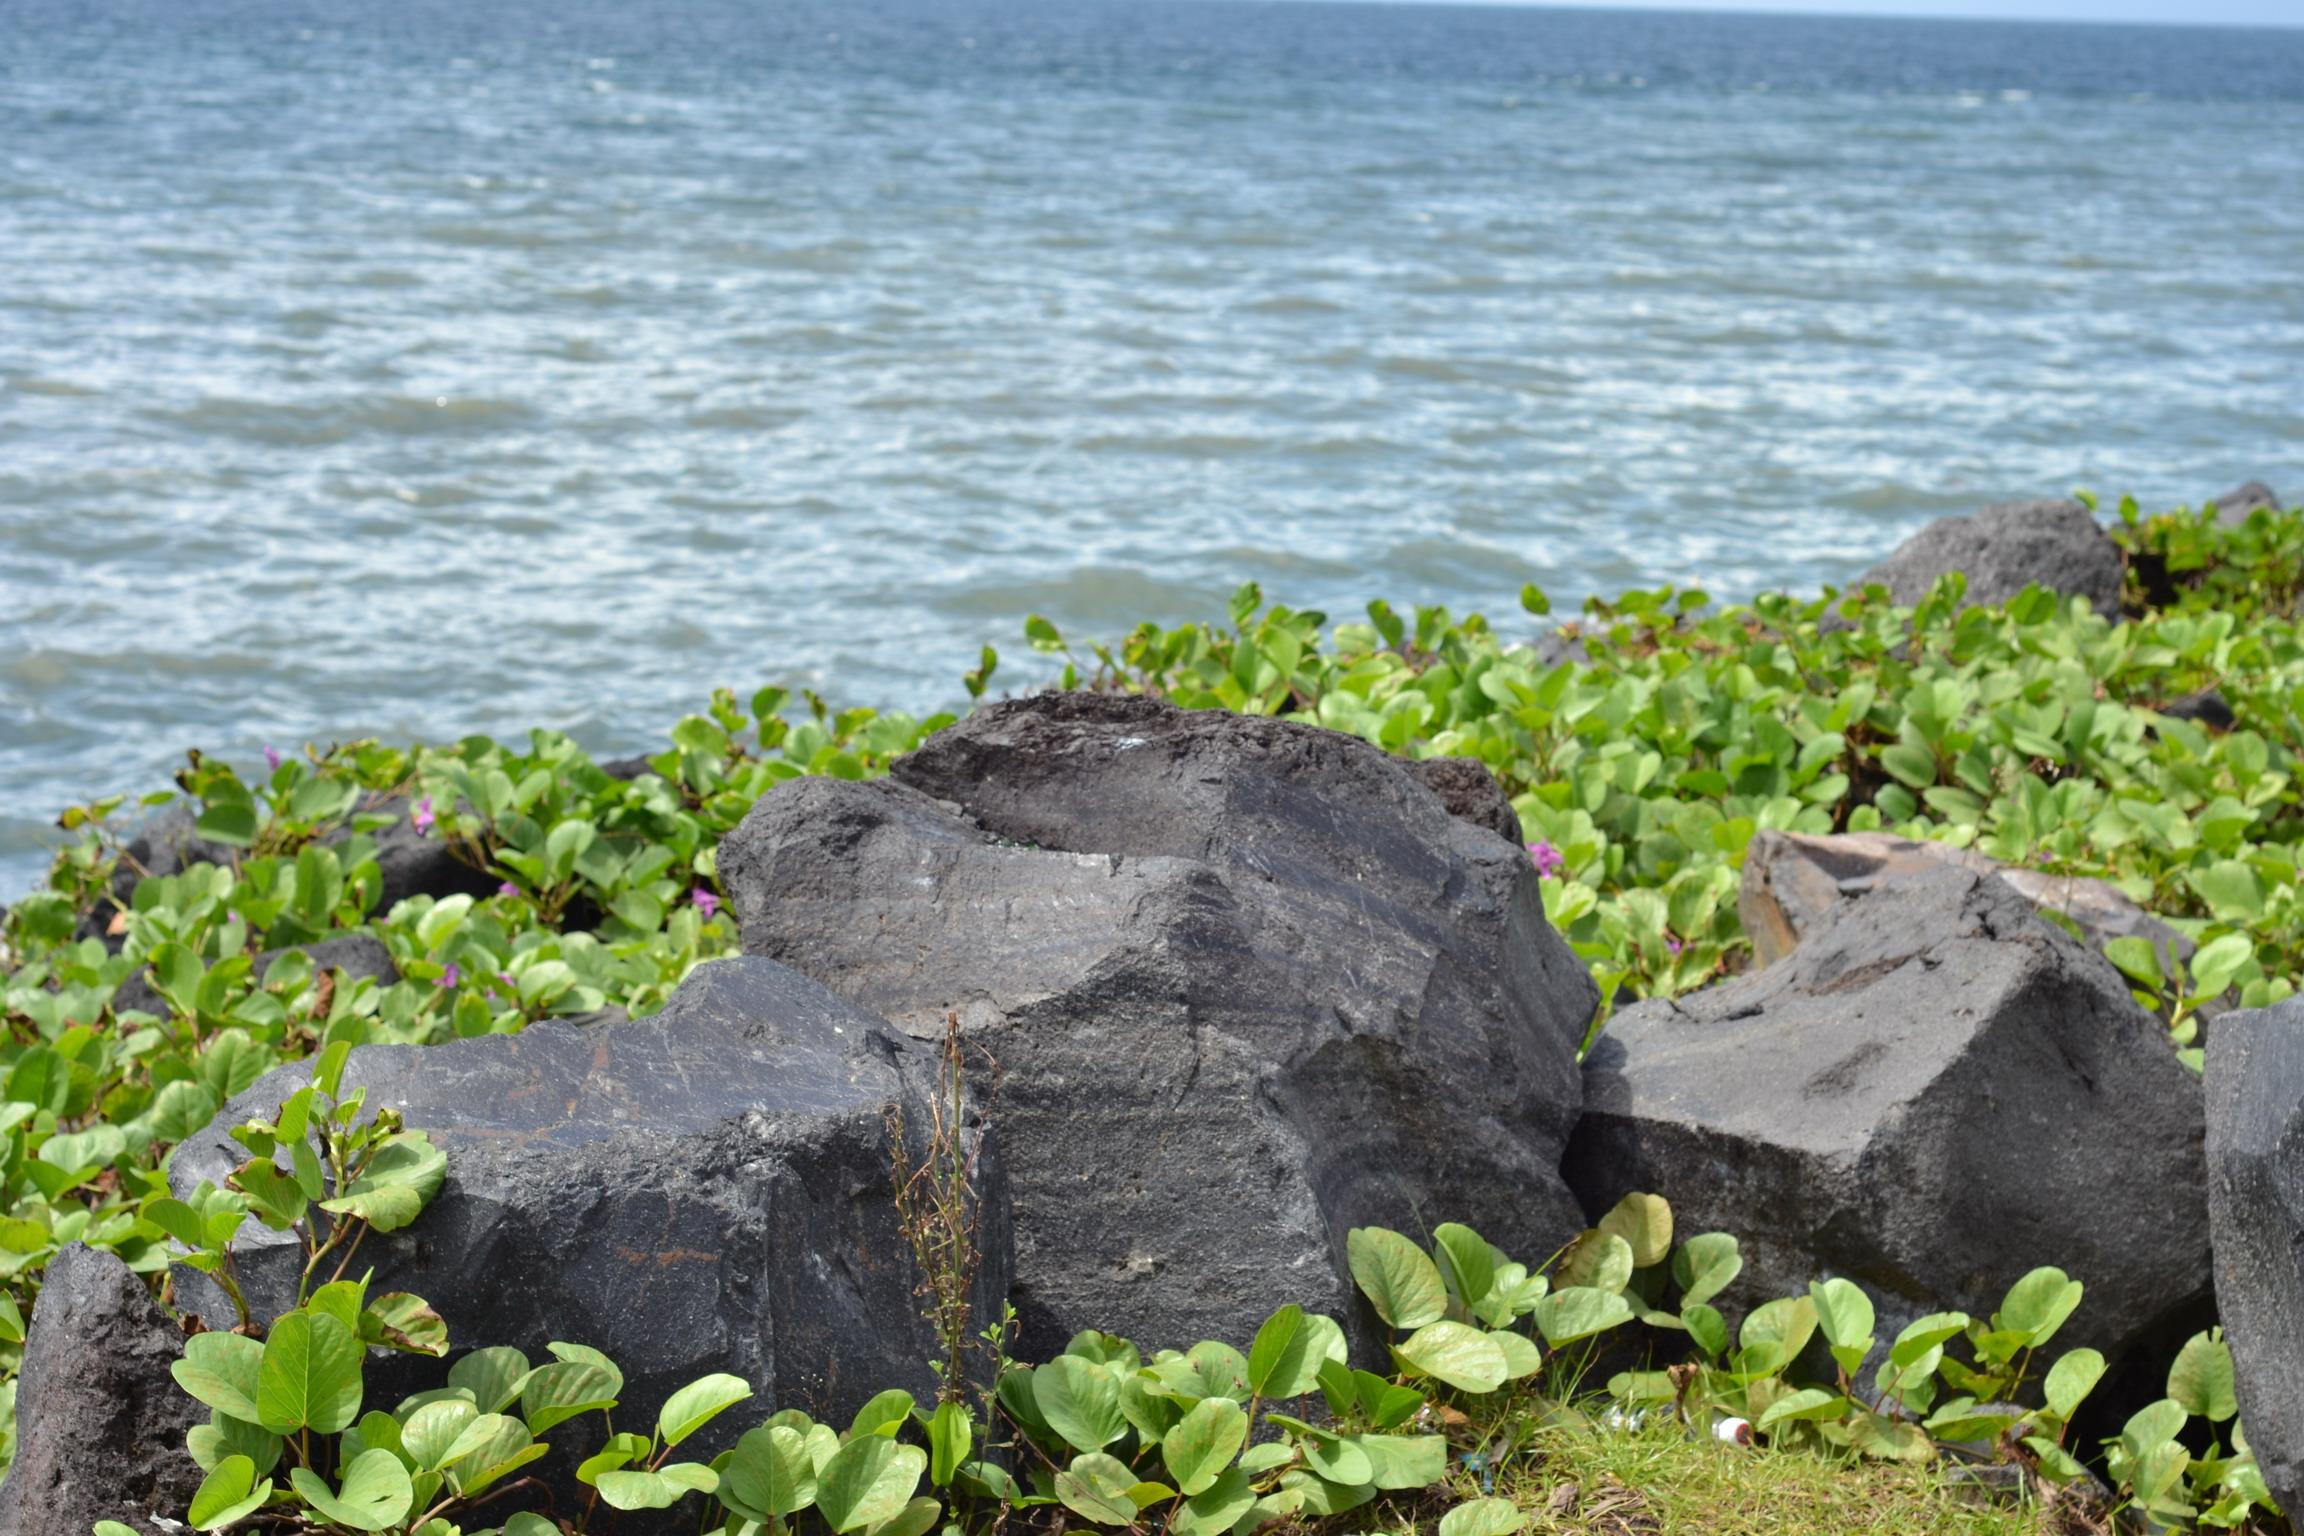 Big stones and plantation photo